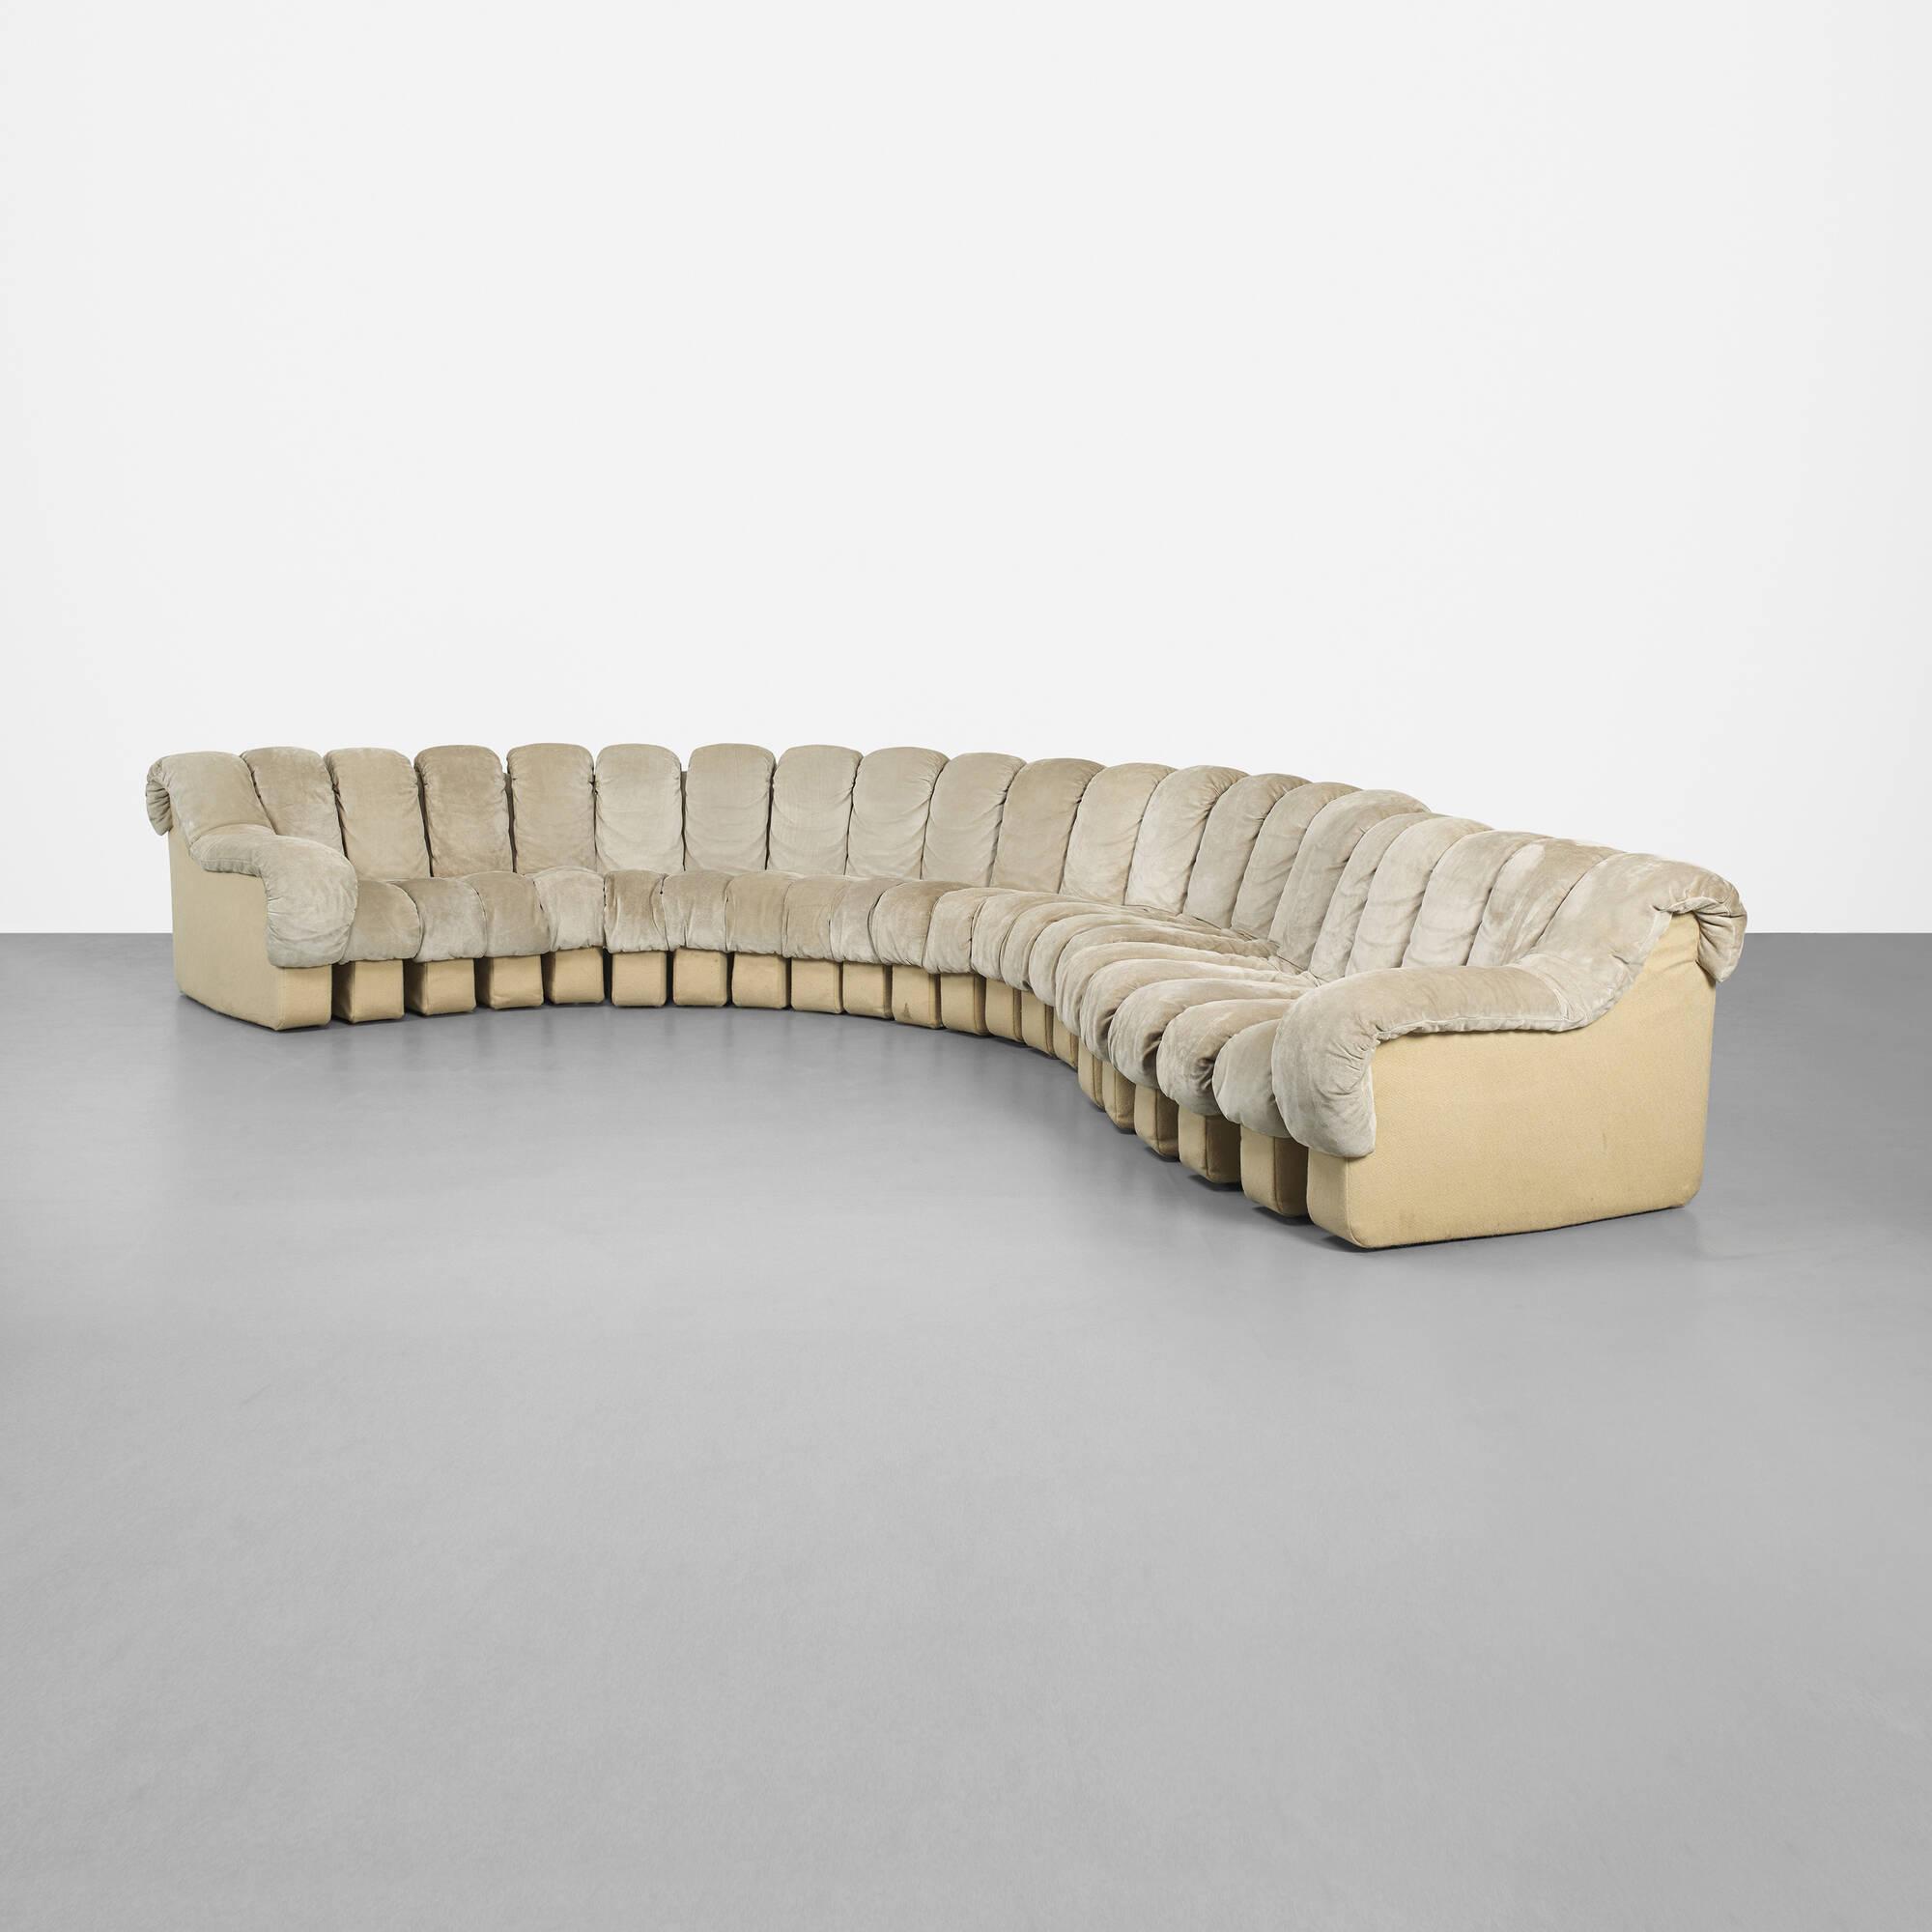 354: Ueli Berger, Eleanora Peduzzi Riva And Heinz Ulrich / DS 600 Organic  Sofa (1 Of 3) ...